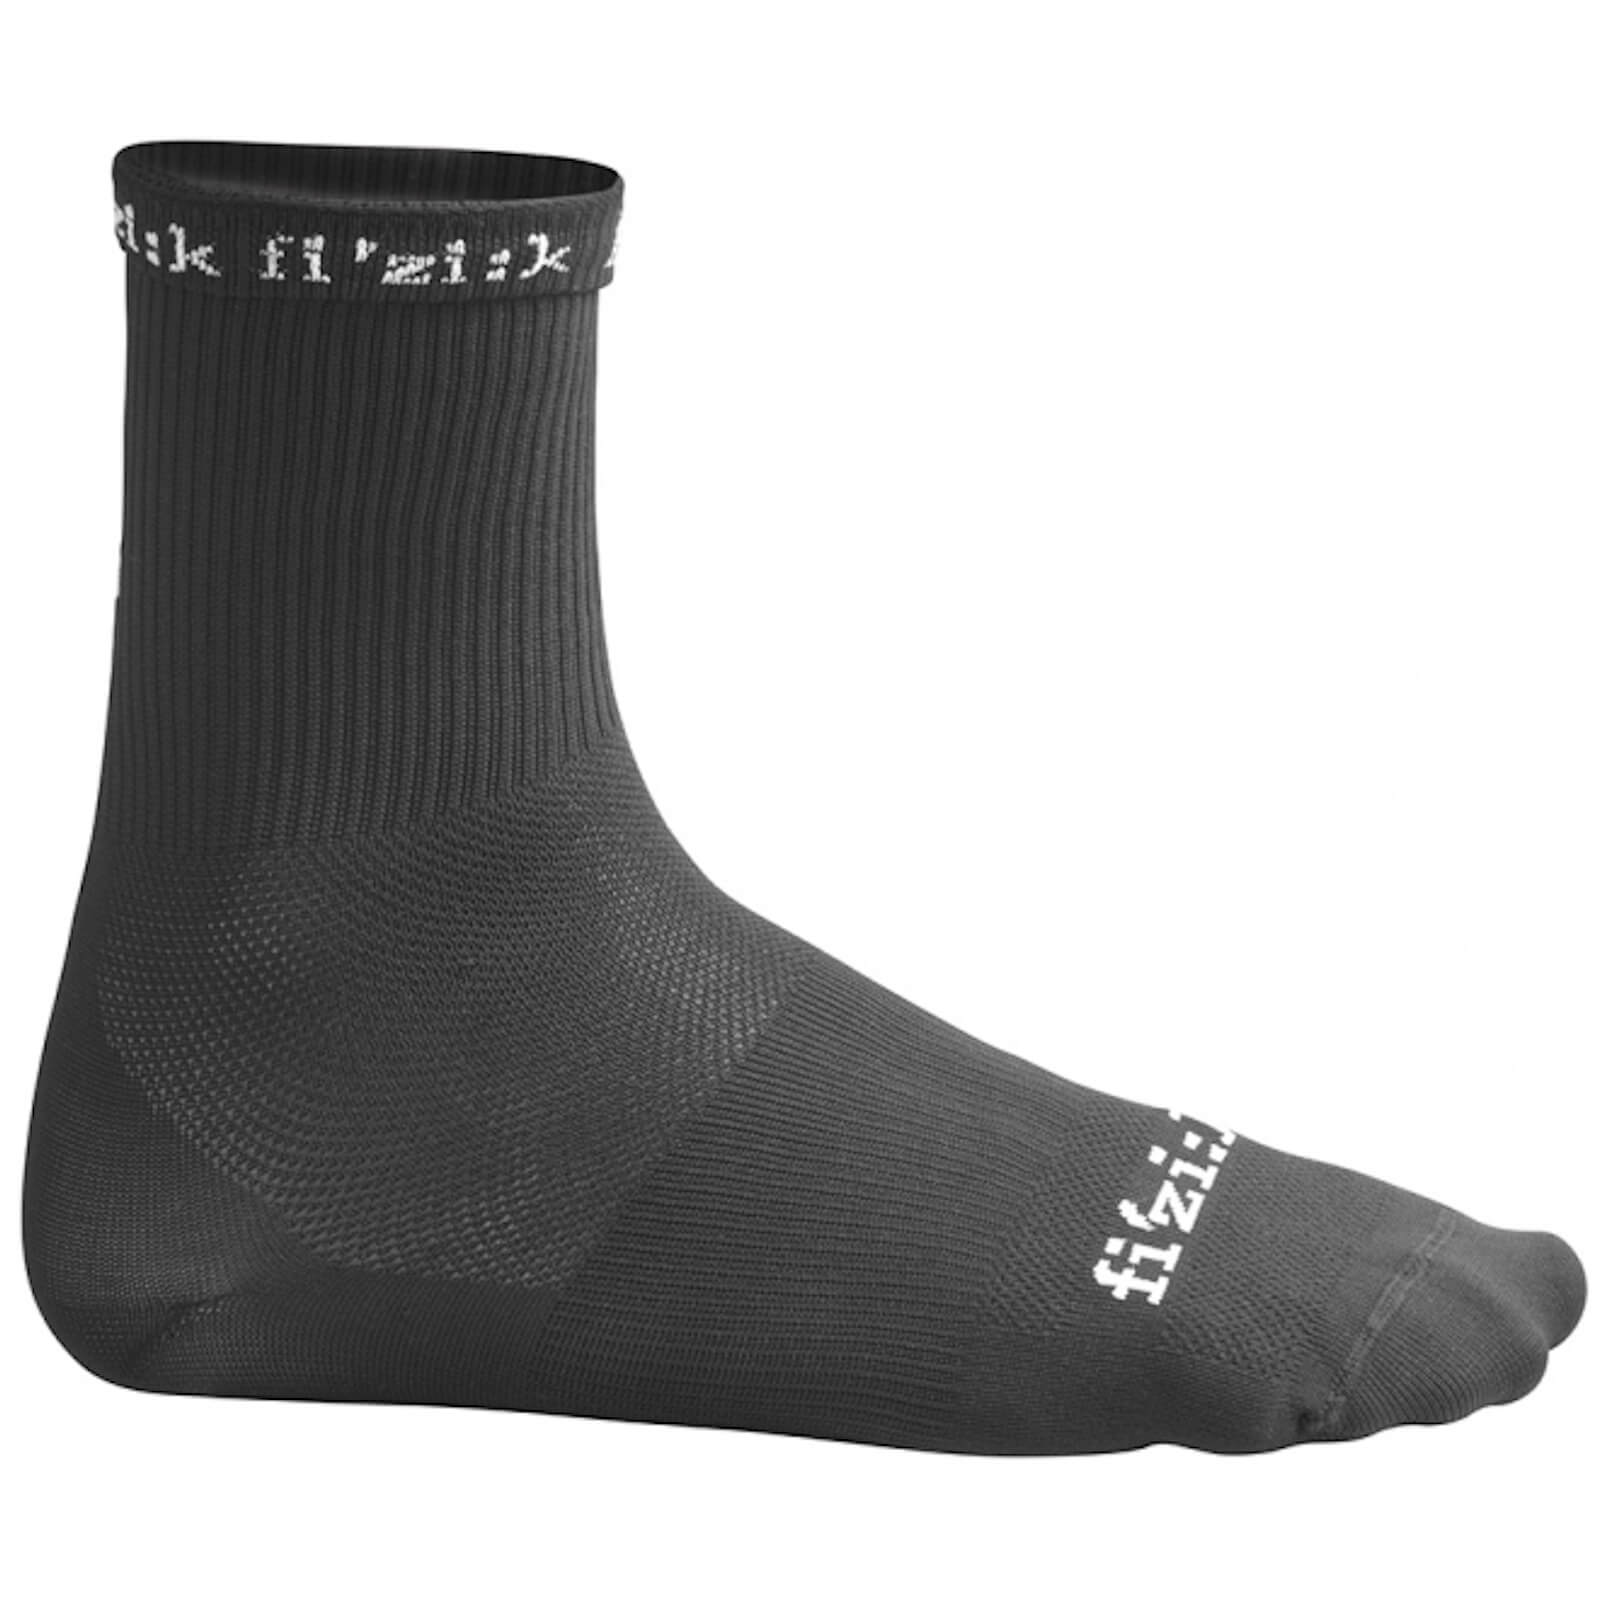 Fizik Summer Socks - Black - XL